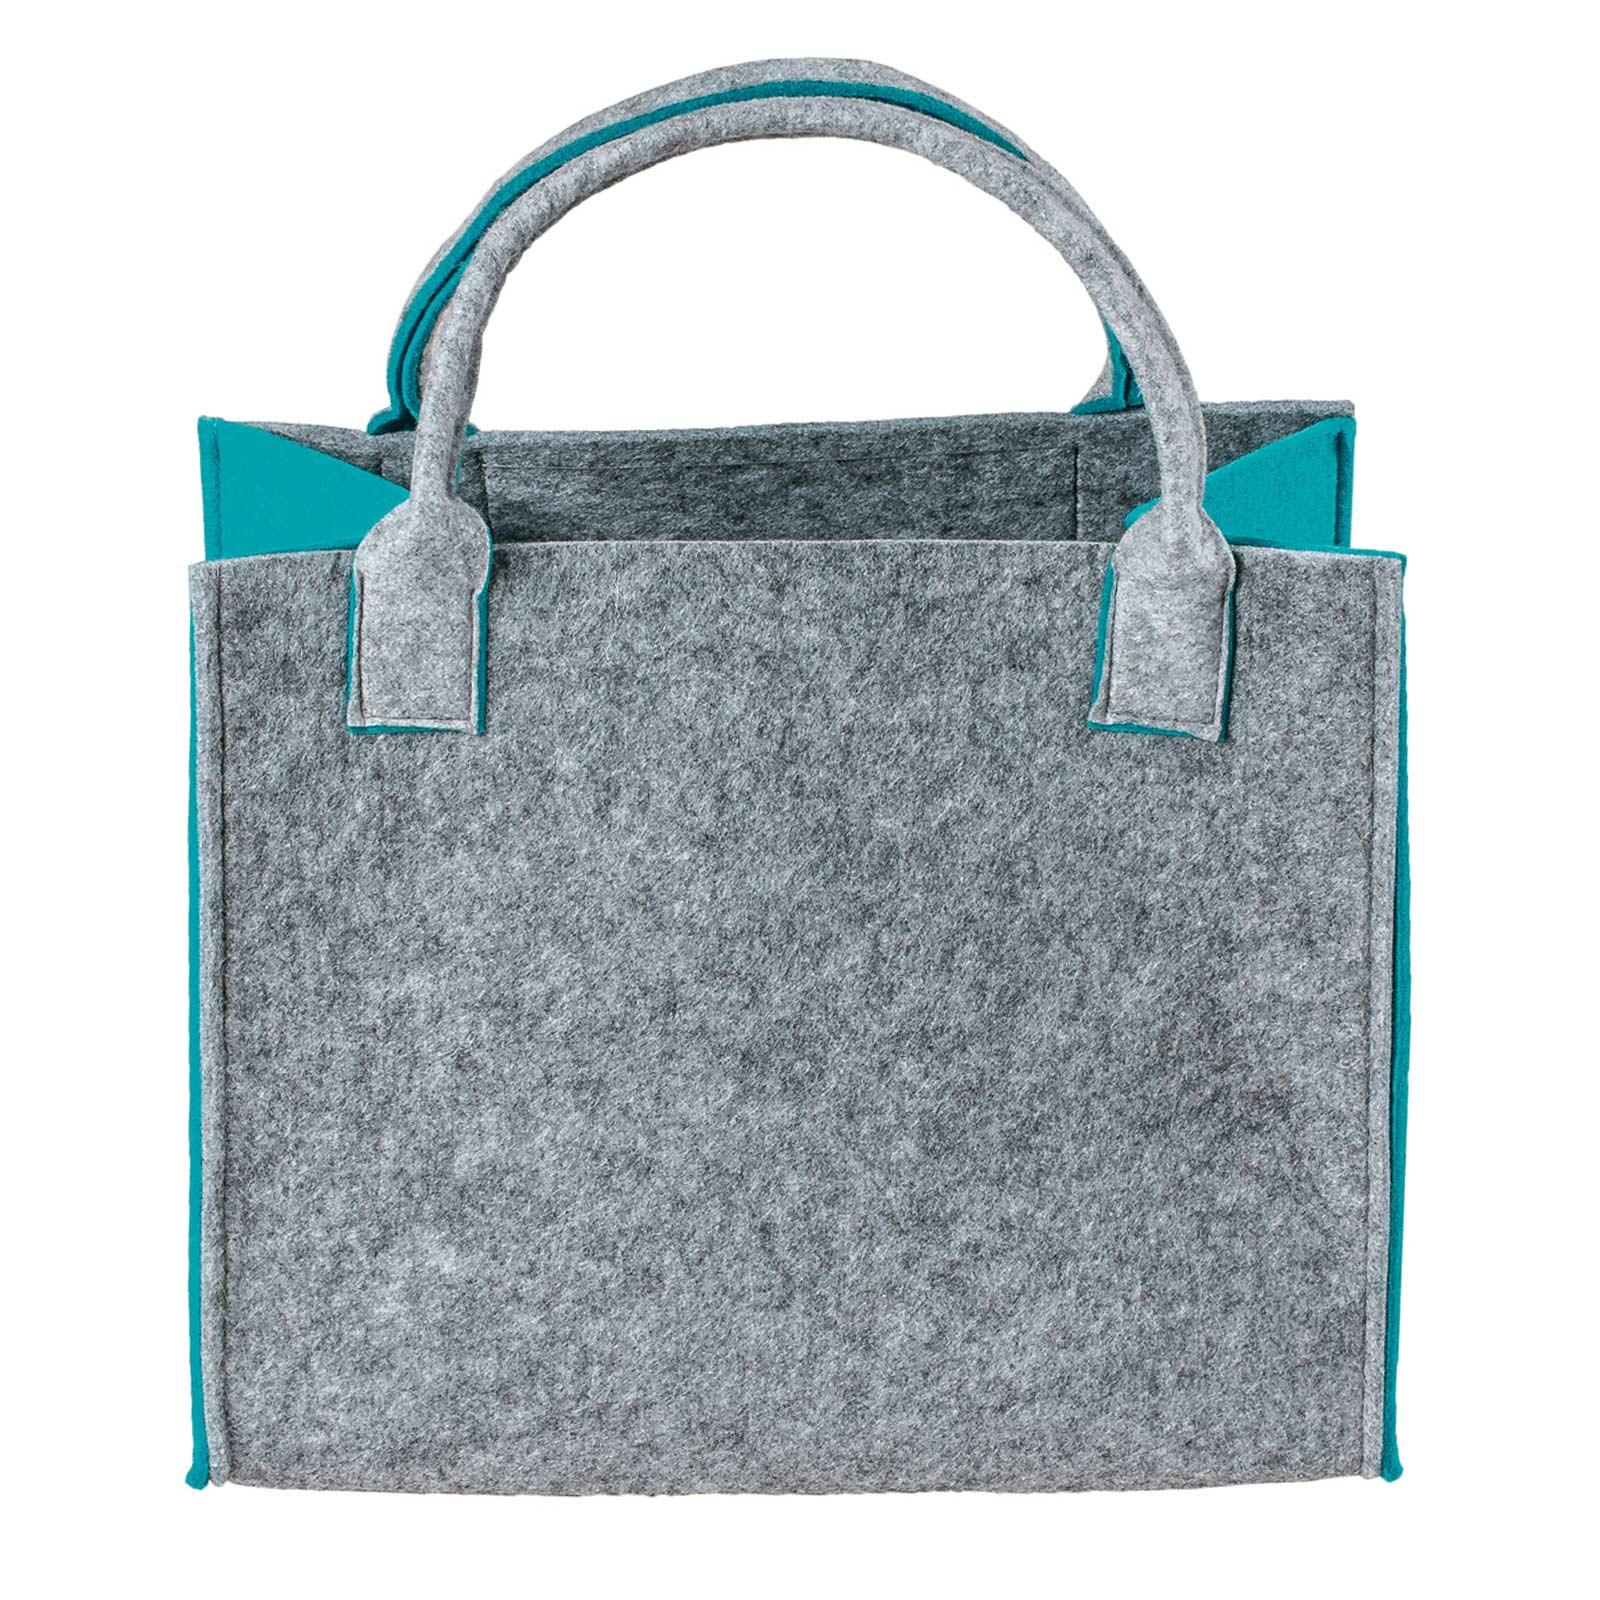 Filztasche, 35x20x43cm, zum gleich Benutzen oder Aufhübschen, 5mm Materialstärke – Bild 7